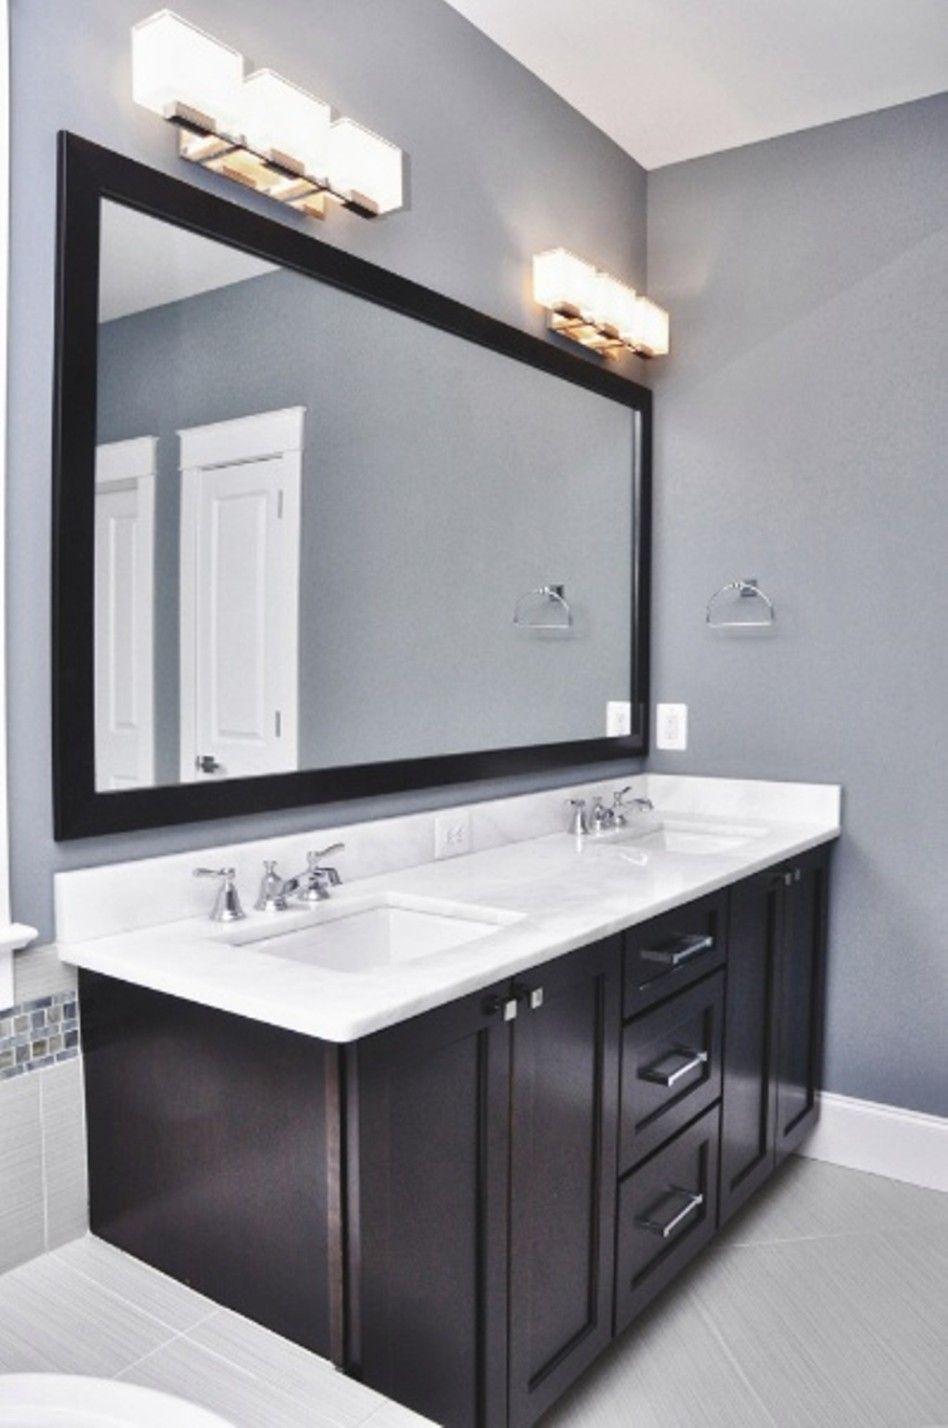 Amazing Picture Of Bathroom Cabinet Lighting Fixtures Interior Design Ideas Home Decorating Inspiration Moercar Modern Bathroom Light Fixtures Light Fixtures Bathroom Vanity Modern Bathroom Lighting